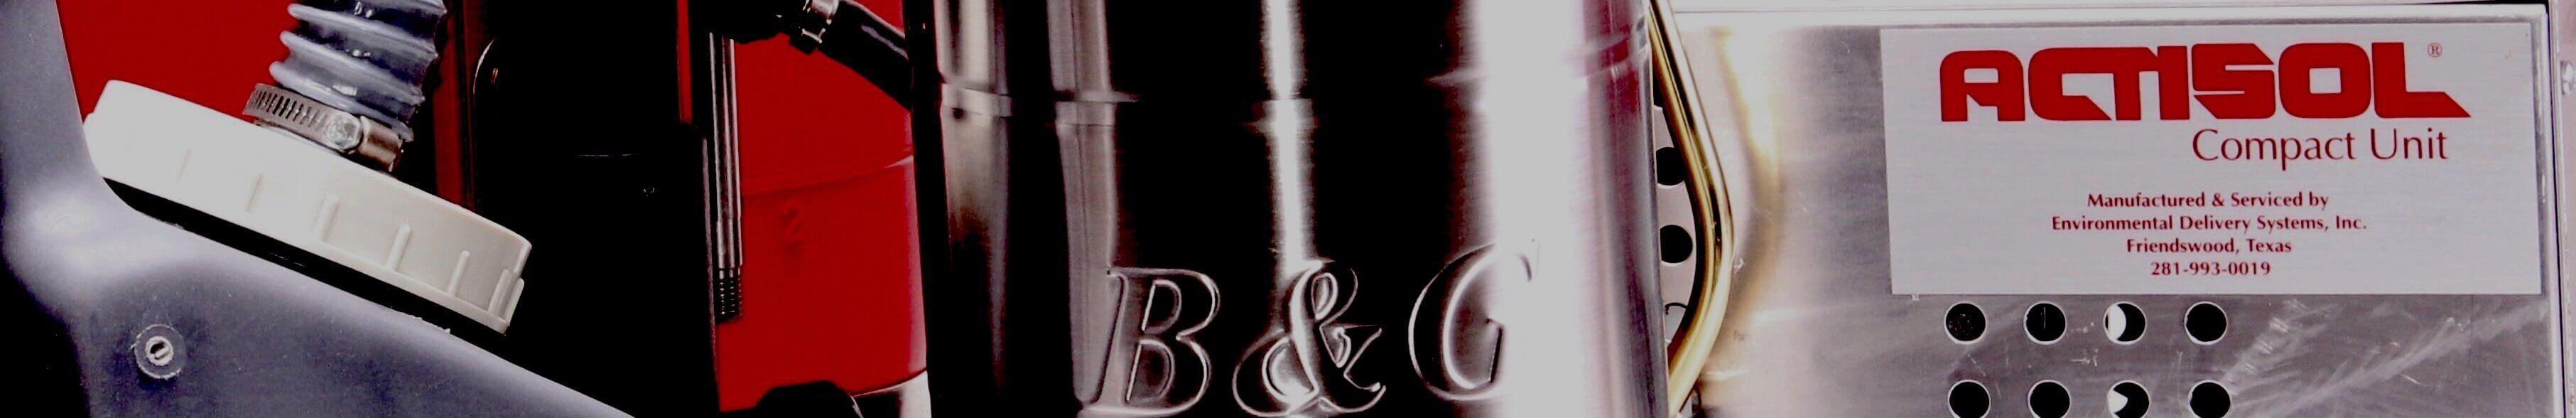 B&G banner